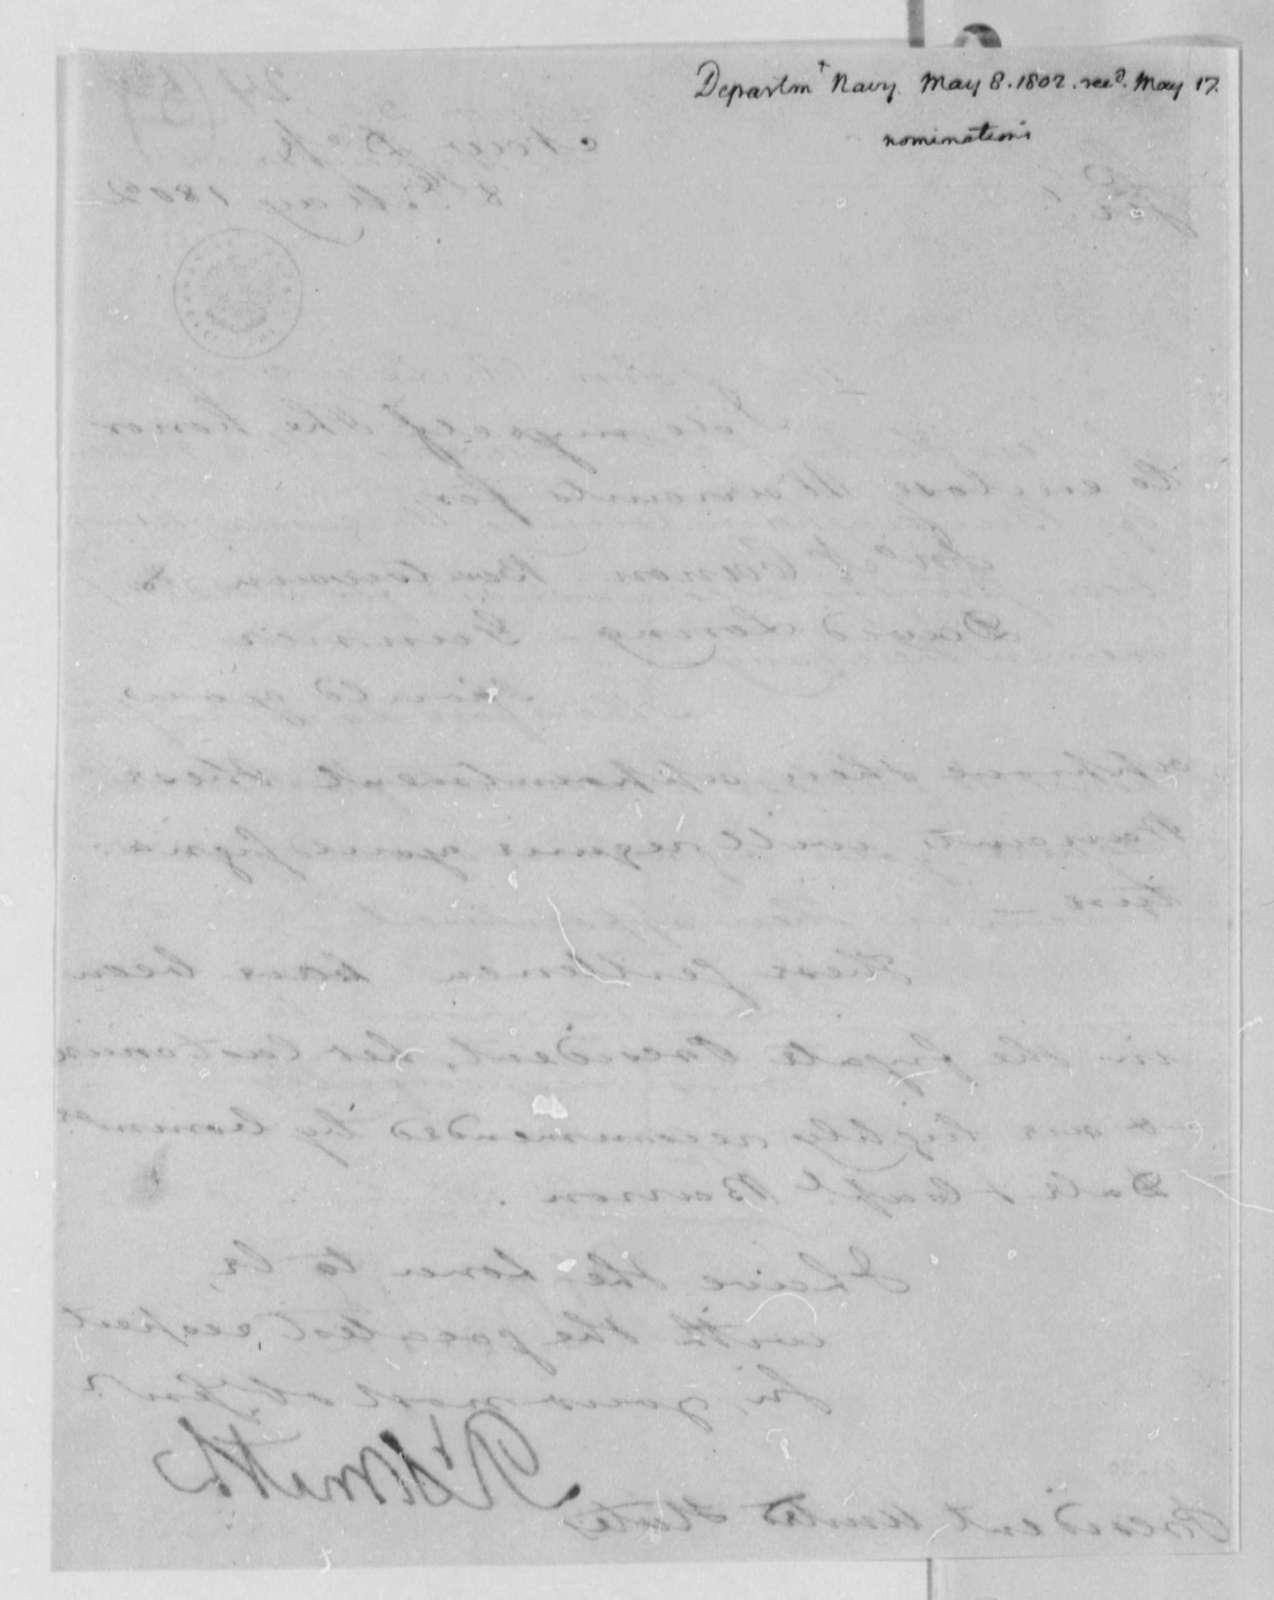 Robert Smith to Thomas Jefferson, May 8, 1802